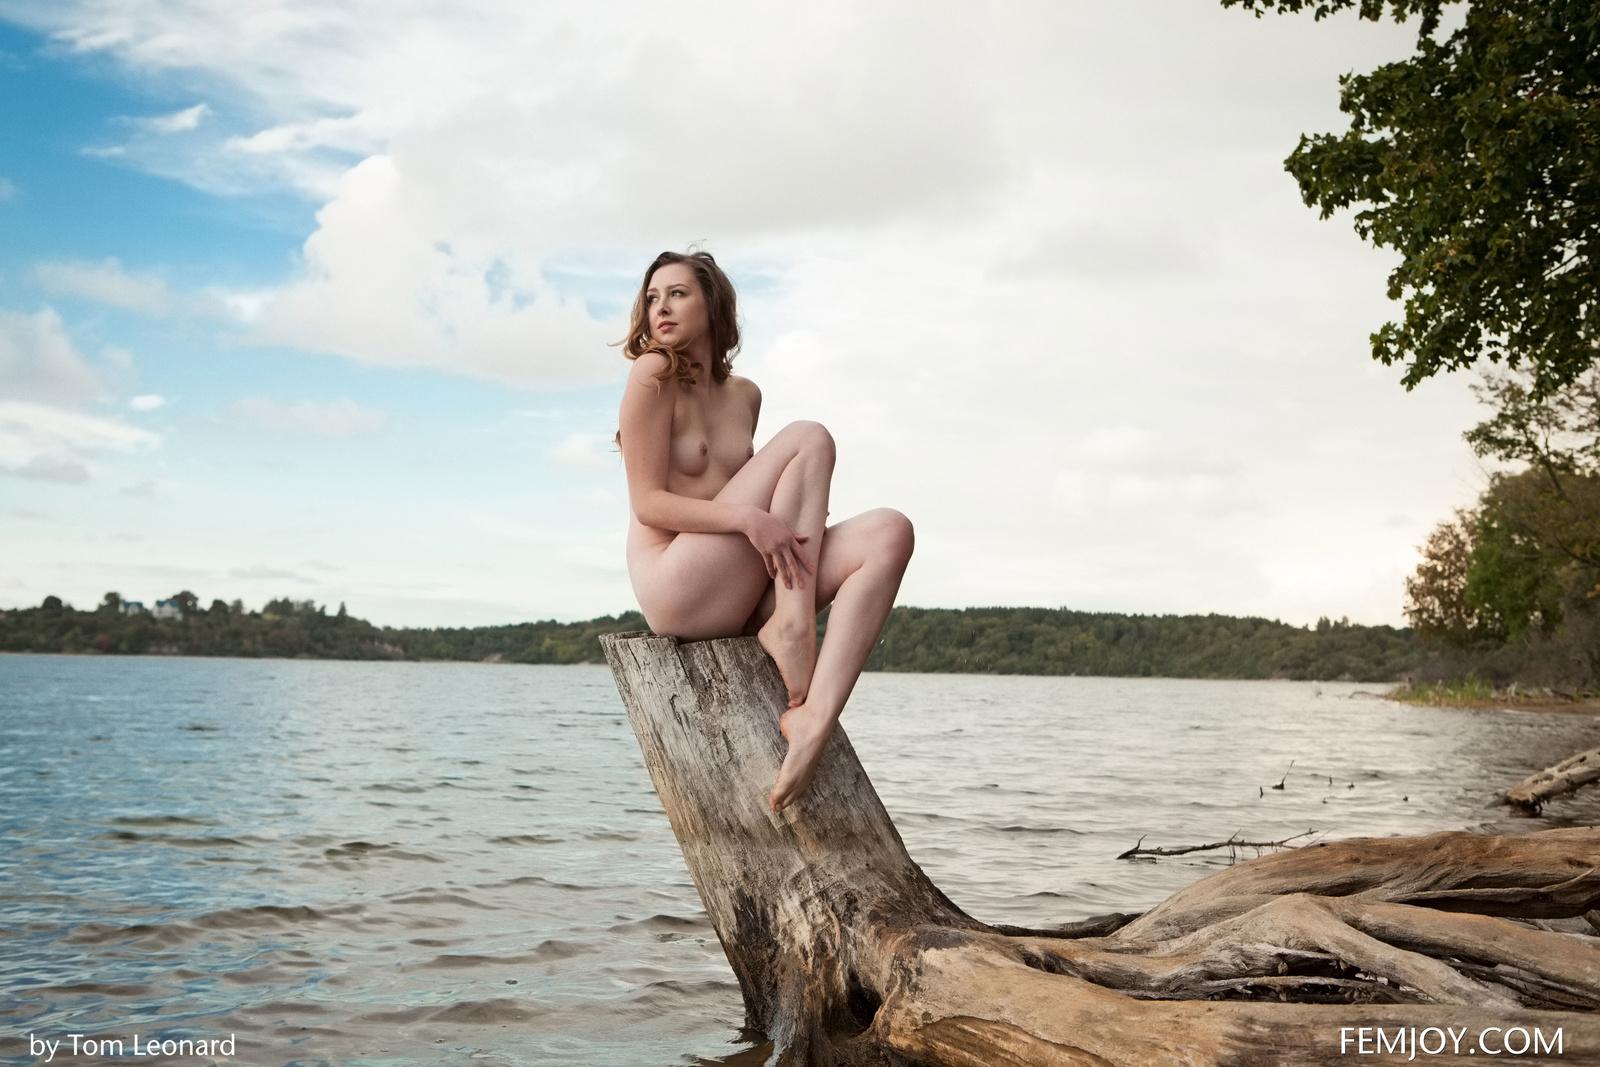 Zdjęcie porno - 043 - Zgrabna i naga laska nad jeziorkiem